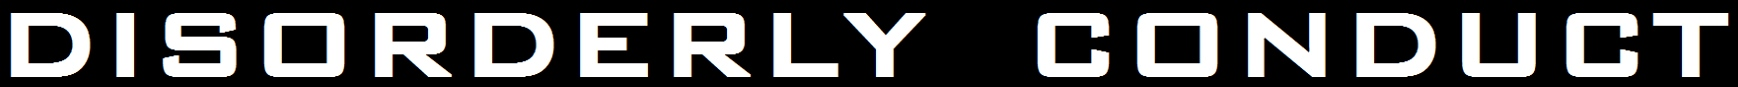 Disorderly Conduct - Logo